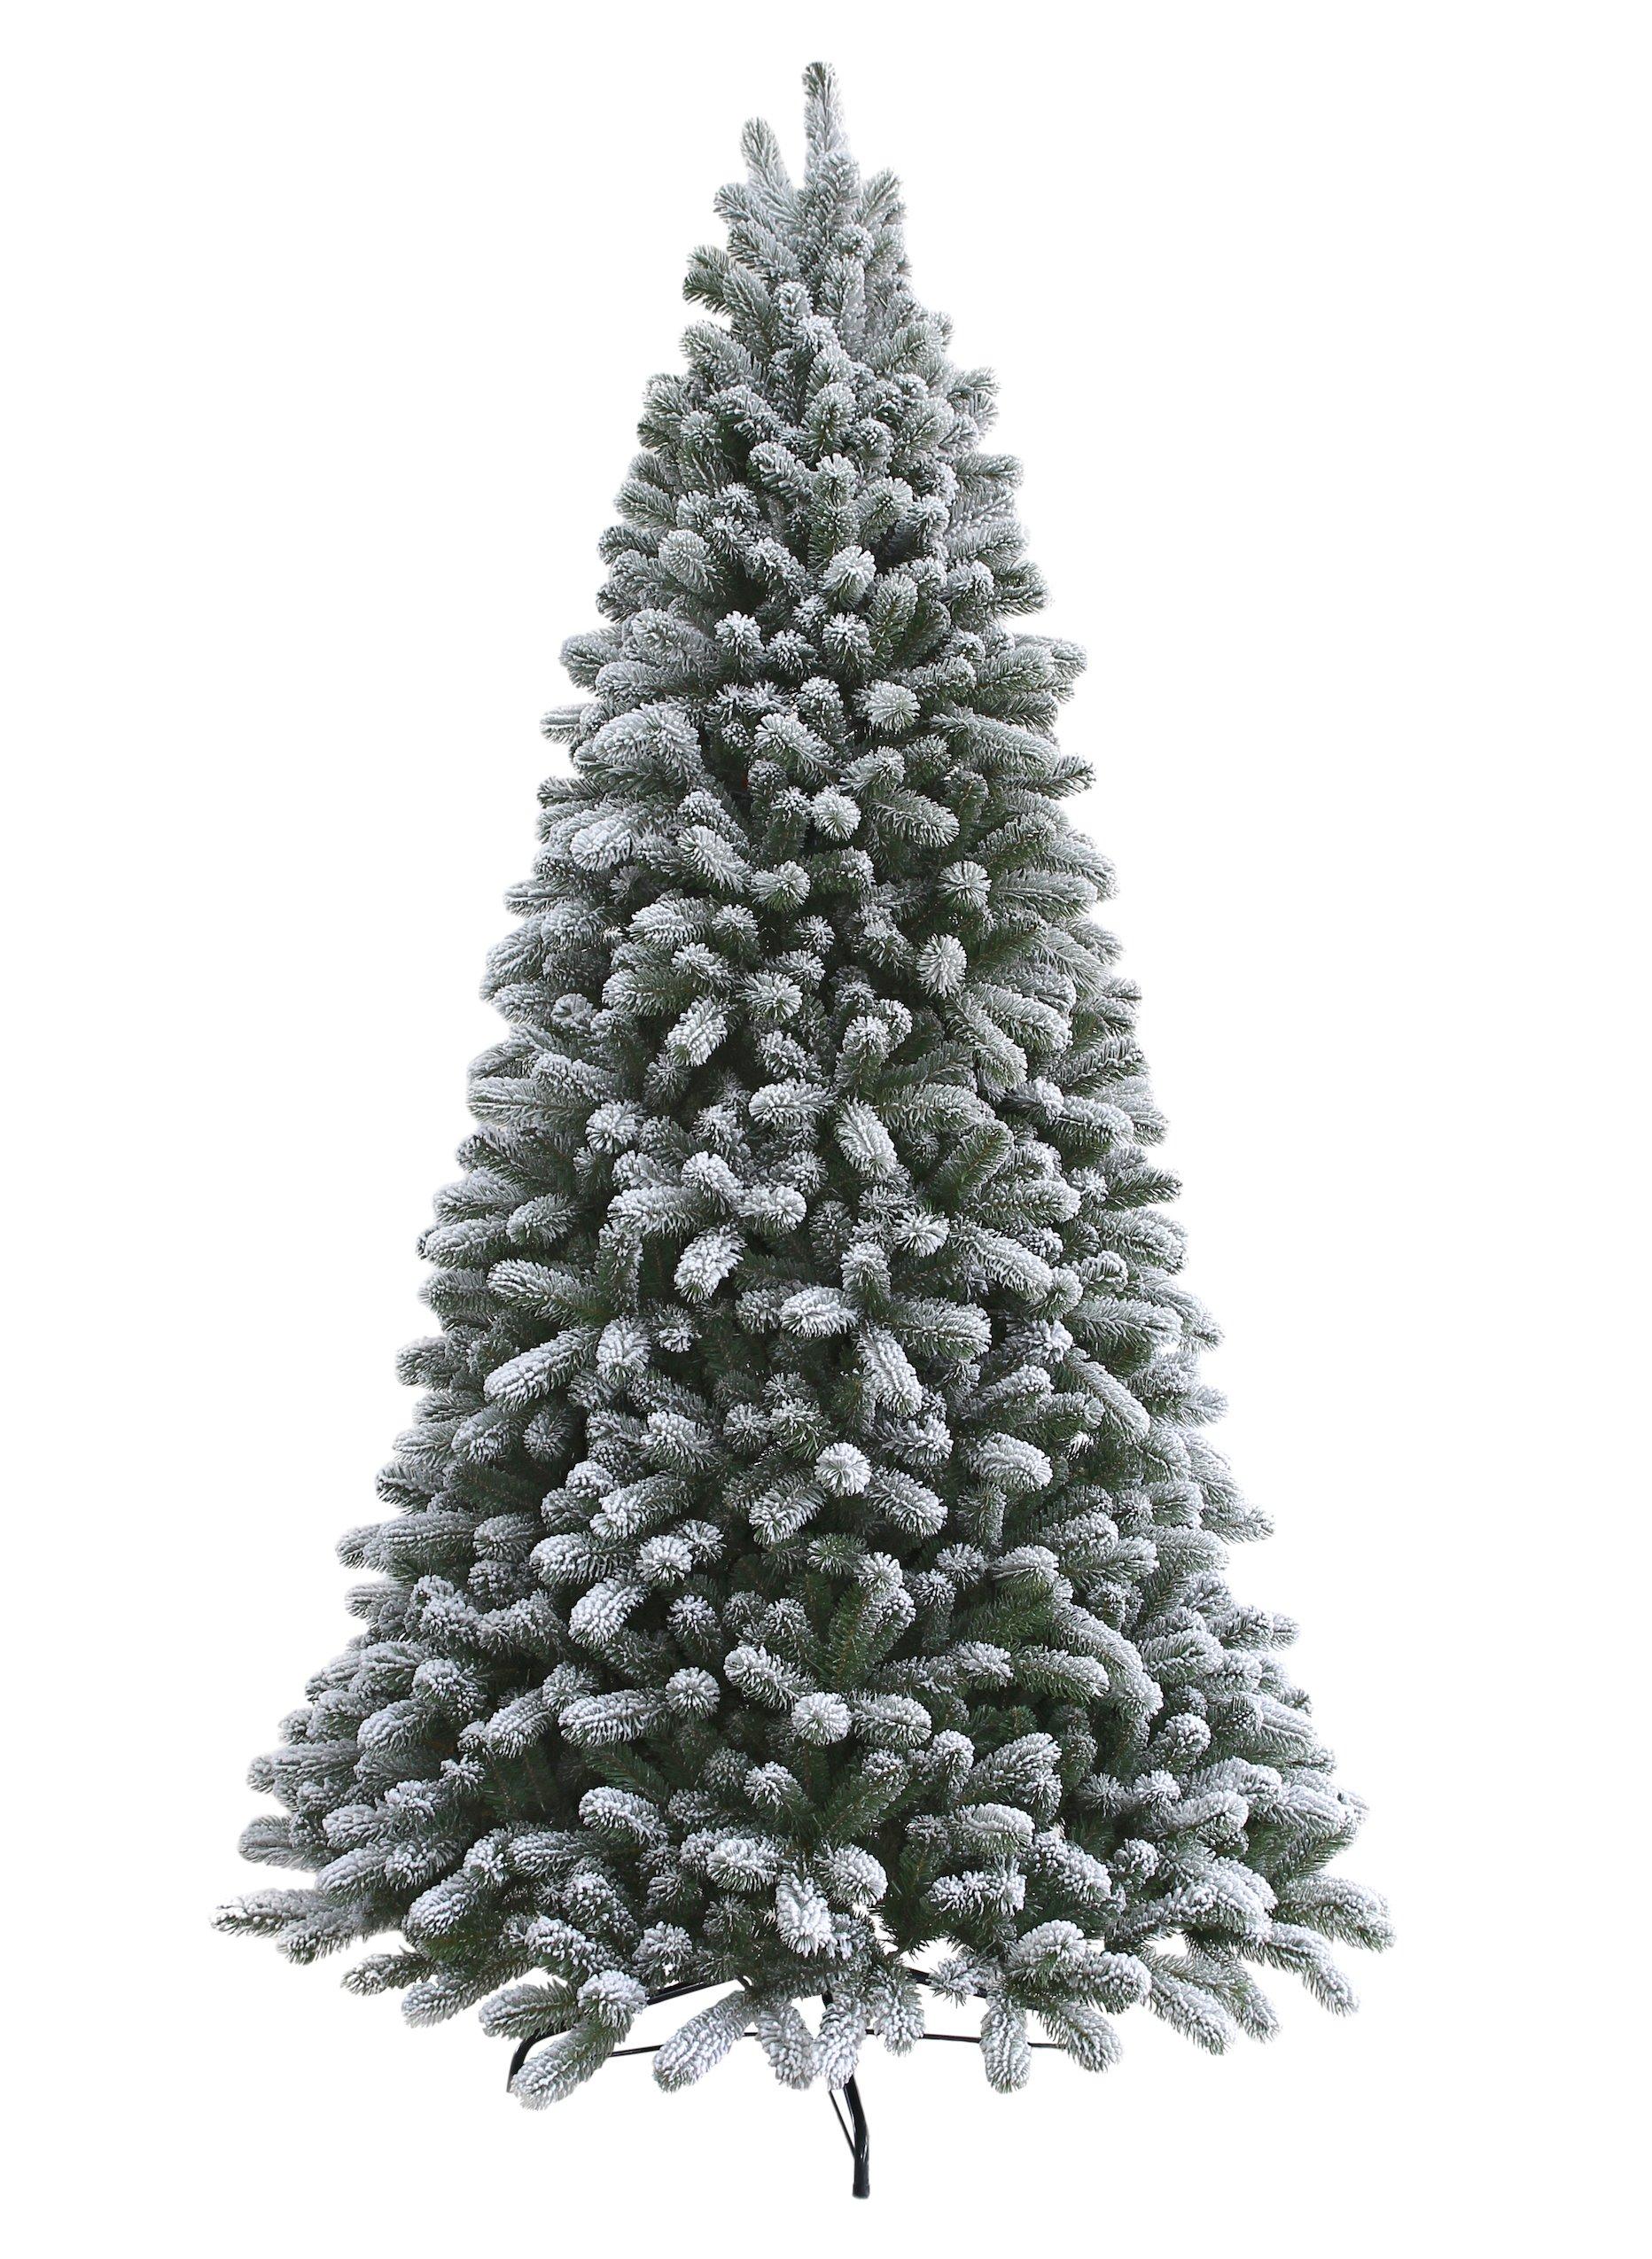 KING OF CHRISTMAS 7.5 Foot King Flock Christmas Tree Unlit, 52'' Wide